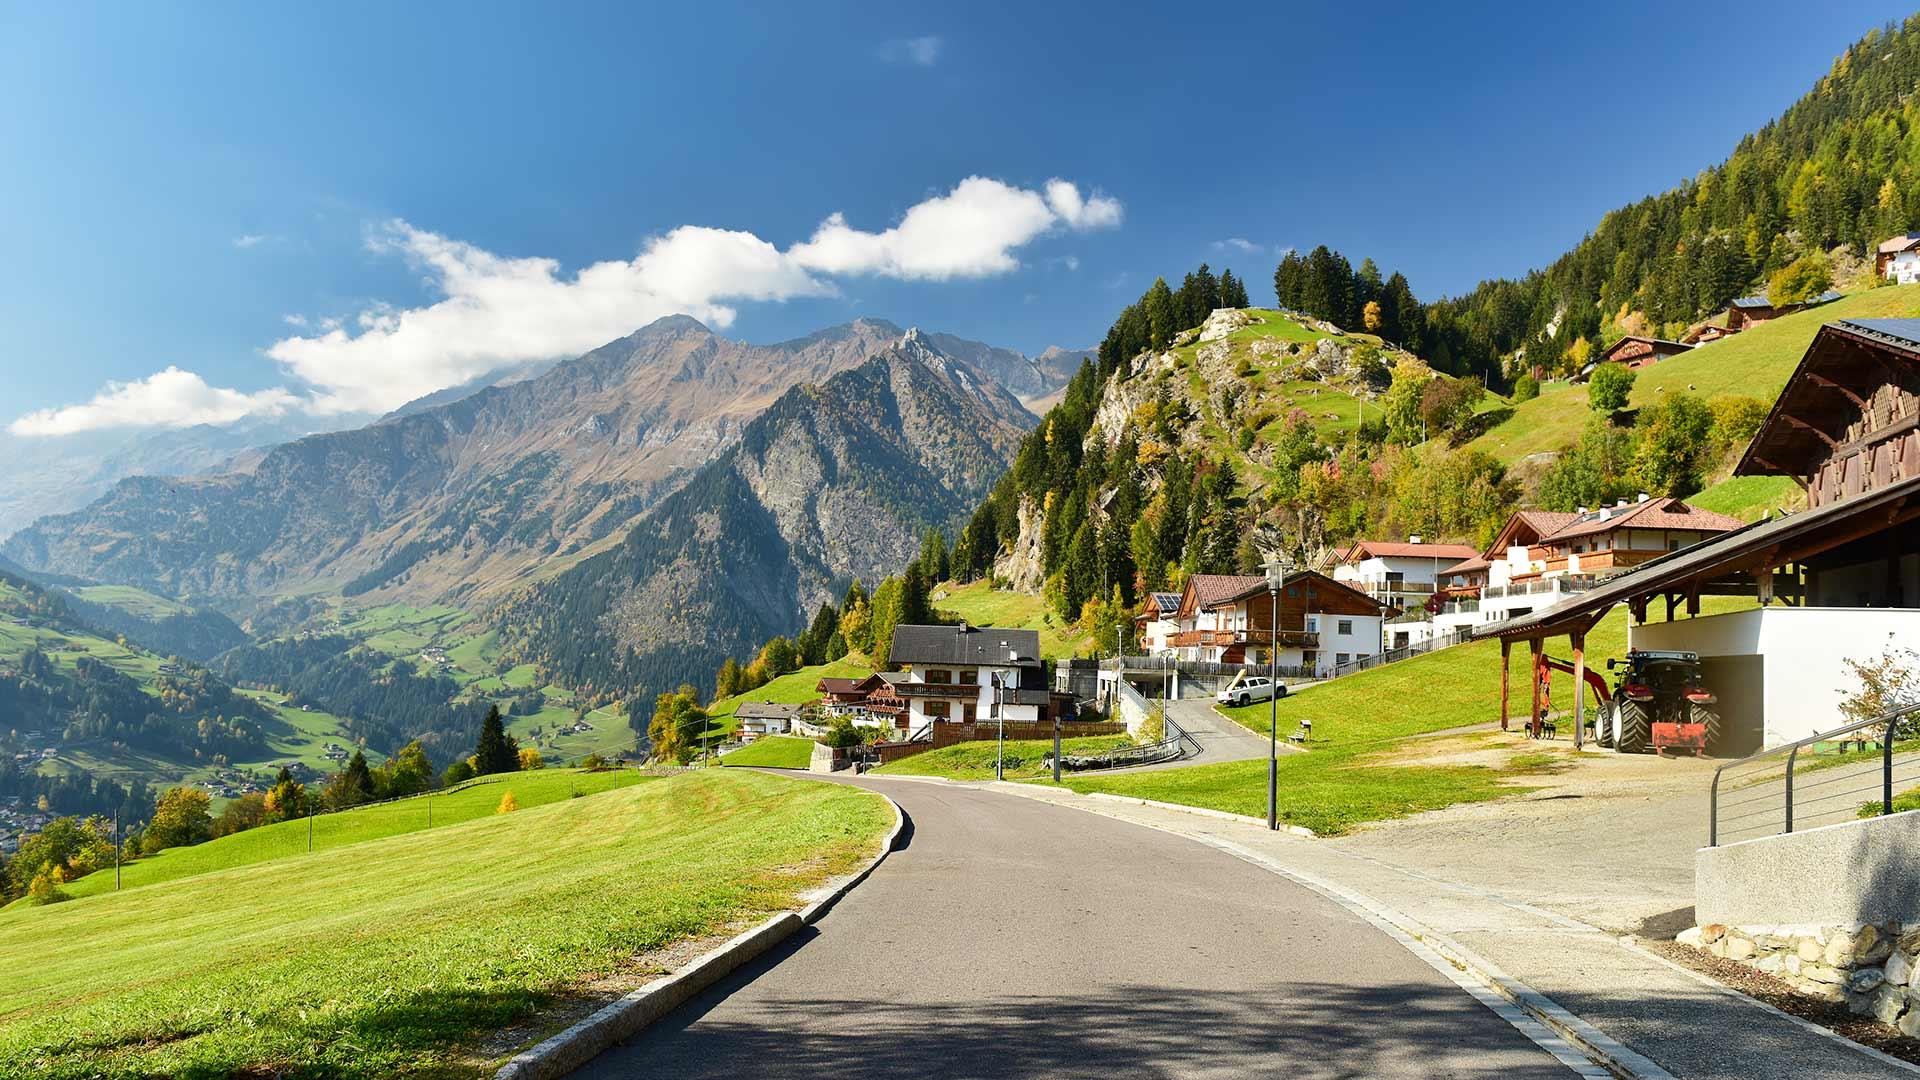 Naturparadies - Moos in Passeier